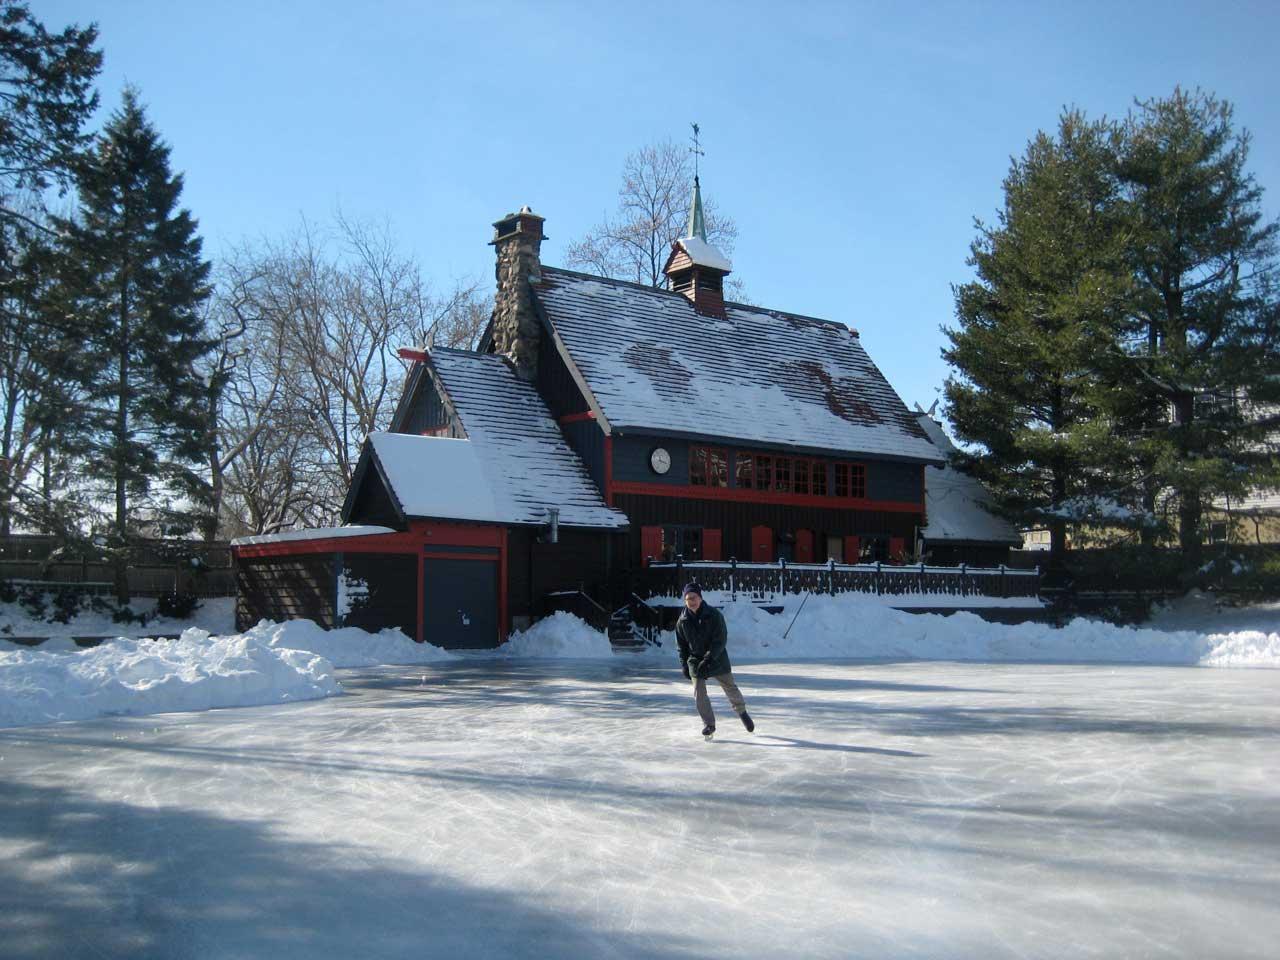 Cambridge Skating Club